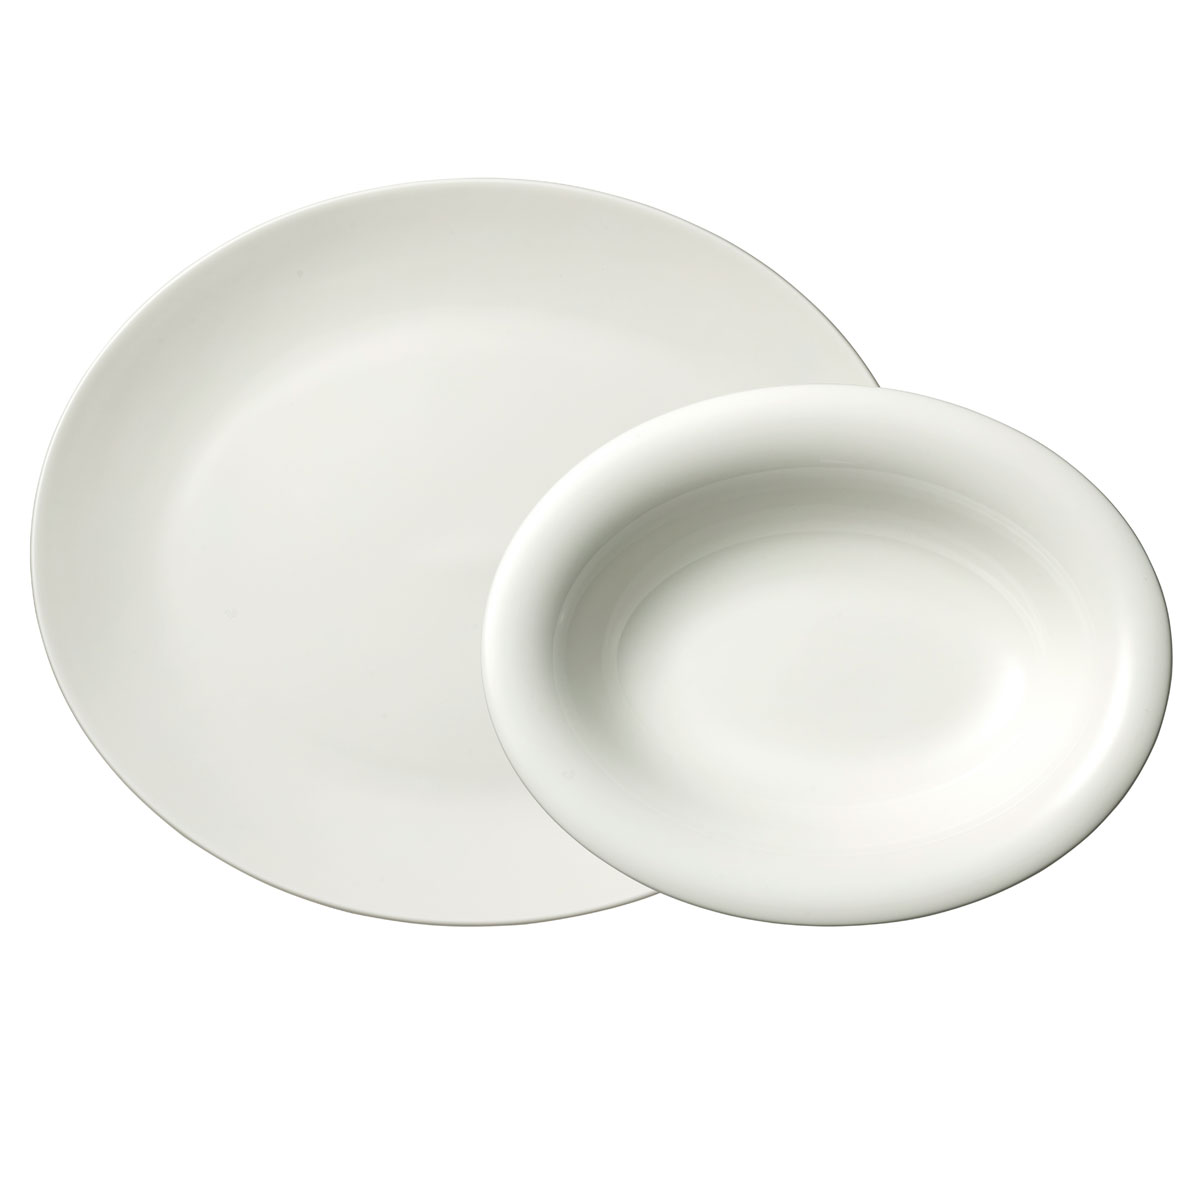 Vera Wang Wedgwood Bone China Perfect White Serving Set